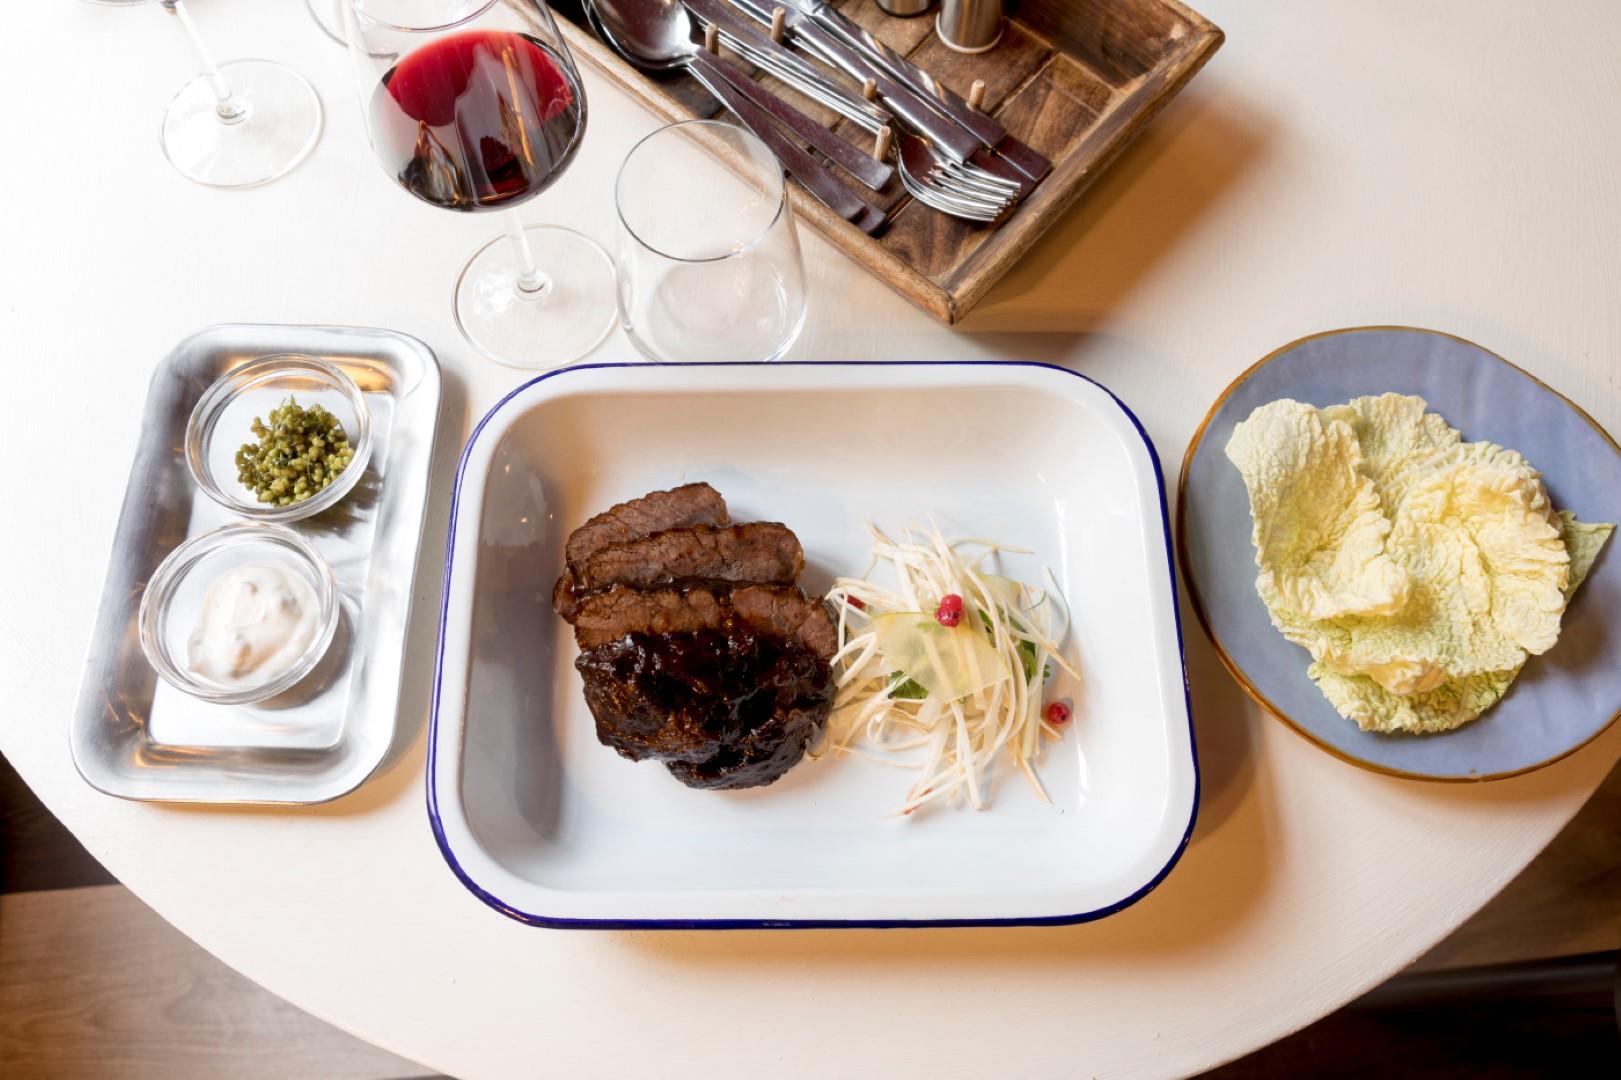 Becho ristorante via Savona Milano